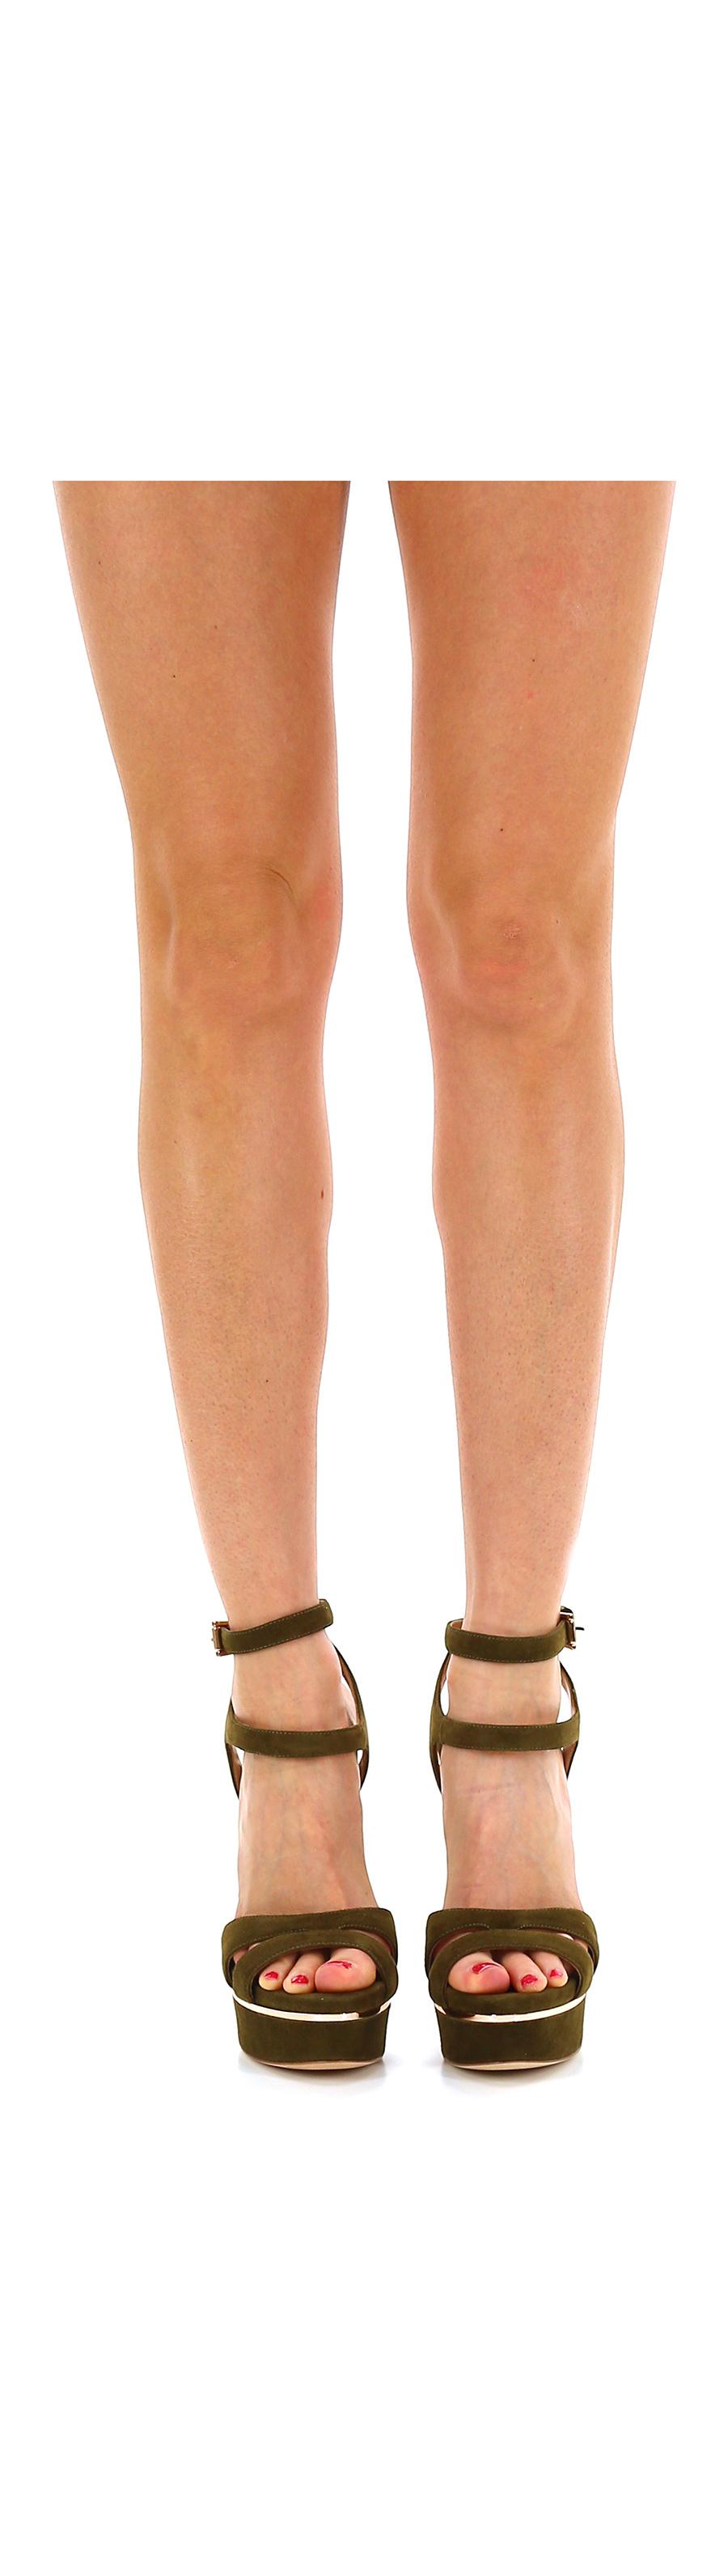 Sandalo  alto  Sandalo Militare Gianni Renzi Couture 7058d6